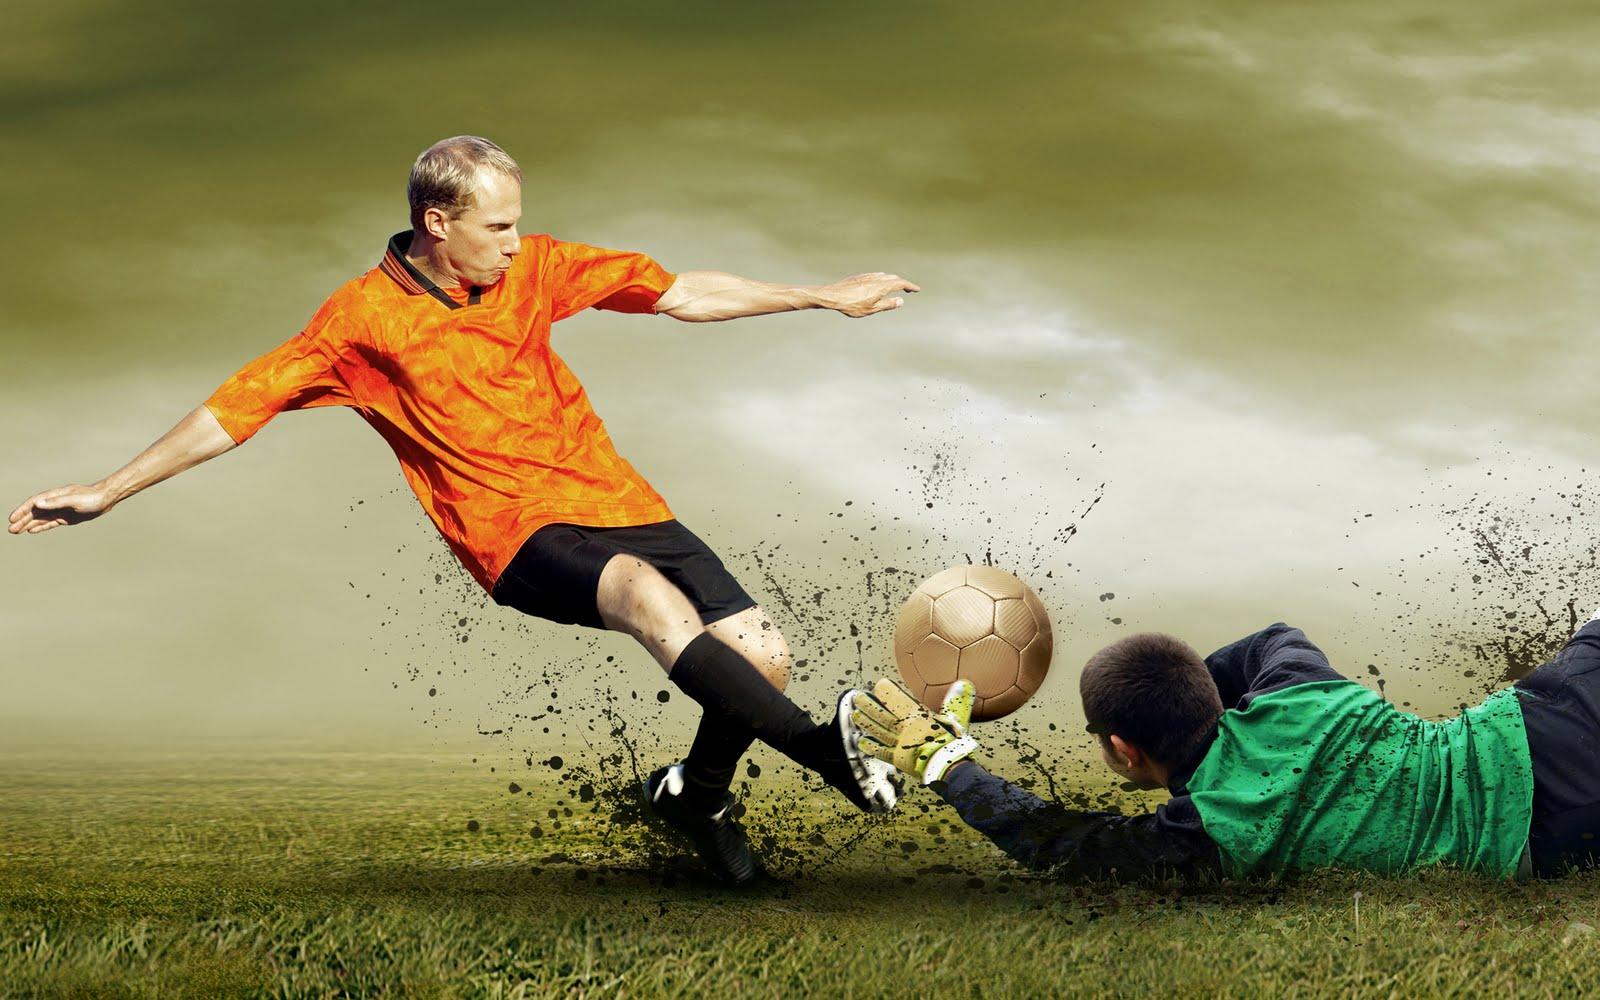 La+pasion+del+futbol+soccer--7.jpg